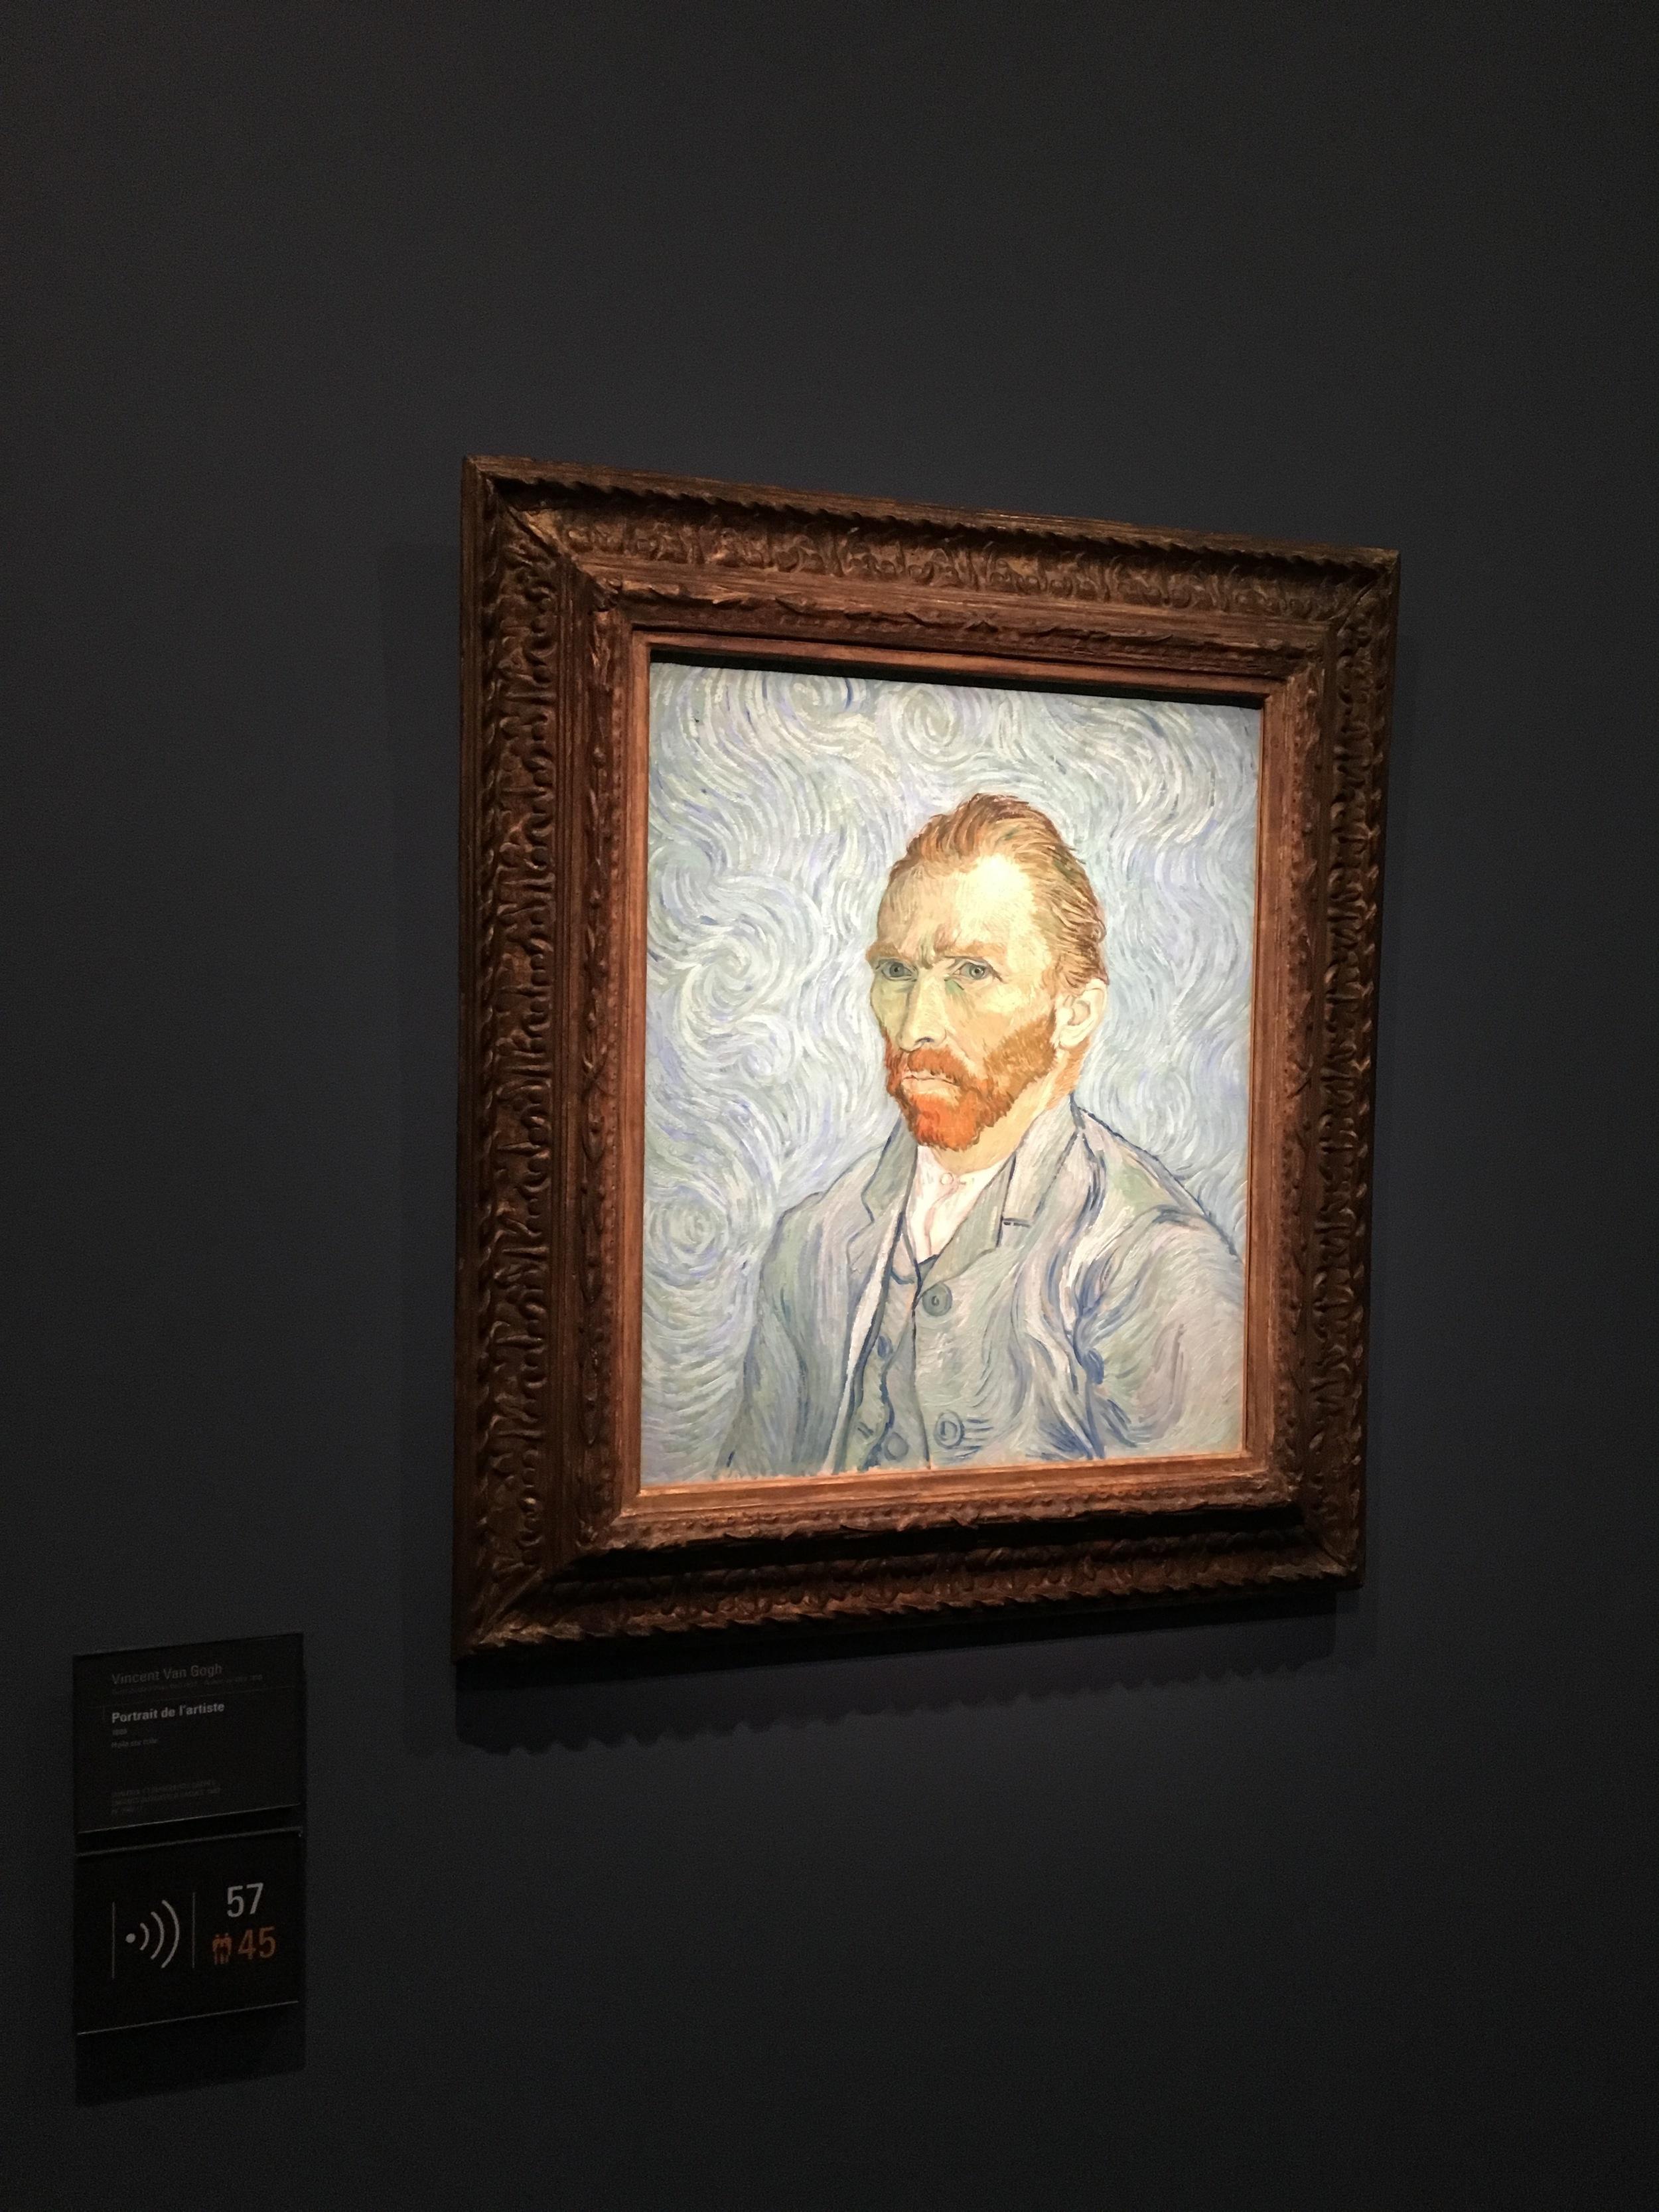 My favorite piece-self portrait of Van Gogh